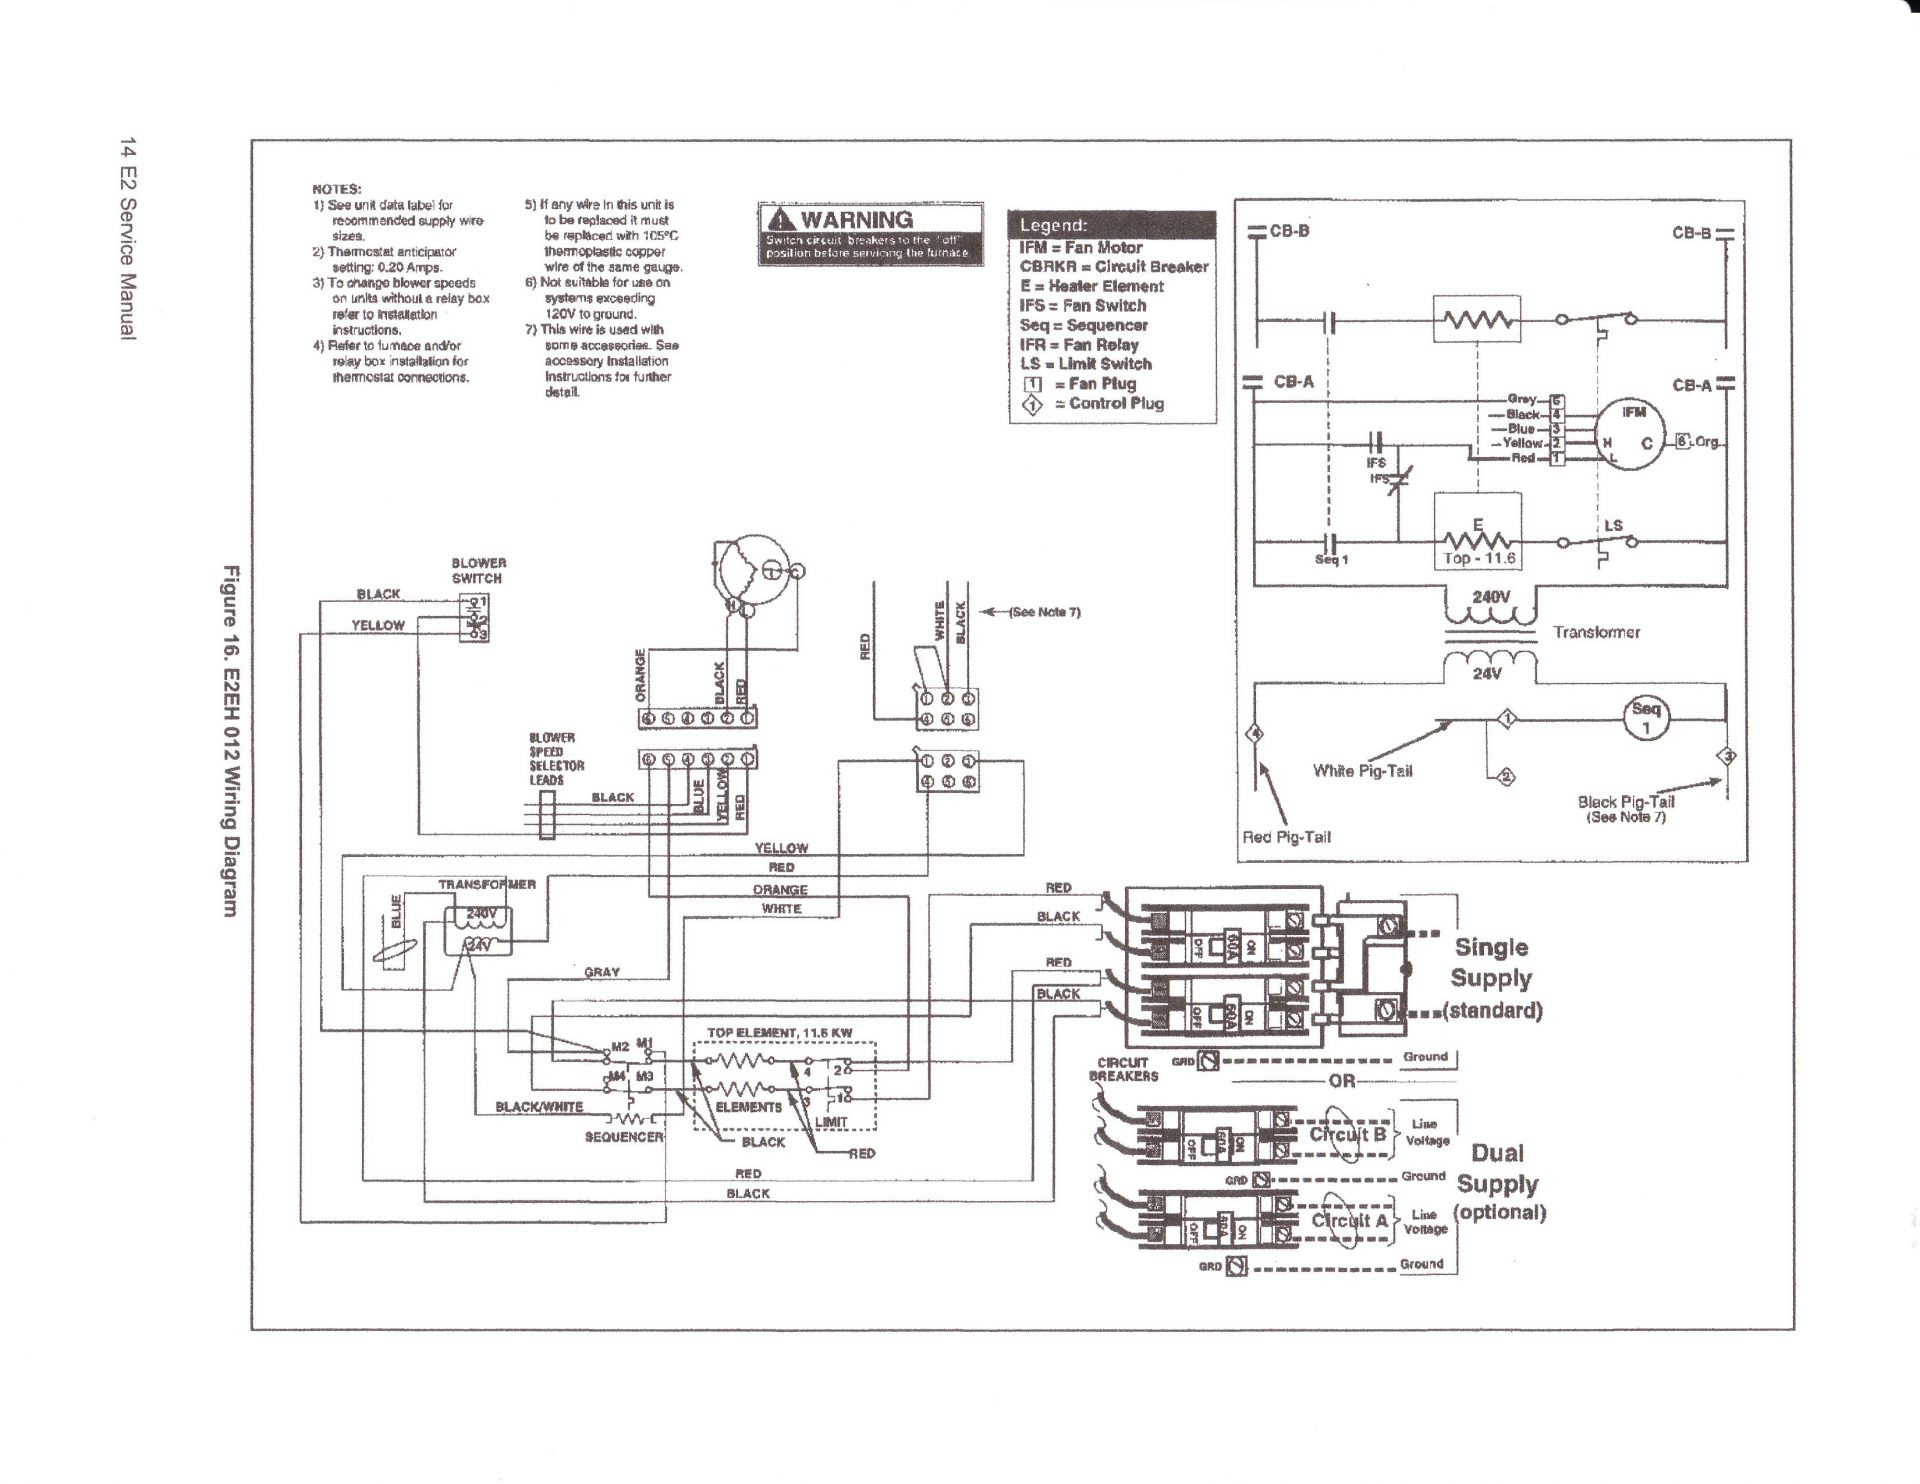 Beckett Oil Burner Wiring Schematic   Manual E-Books - Beckett Oil Burner Wiring Diagram